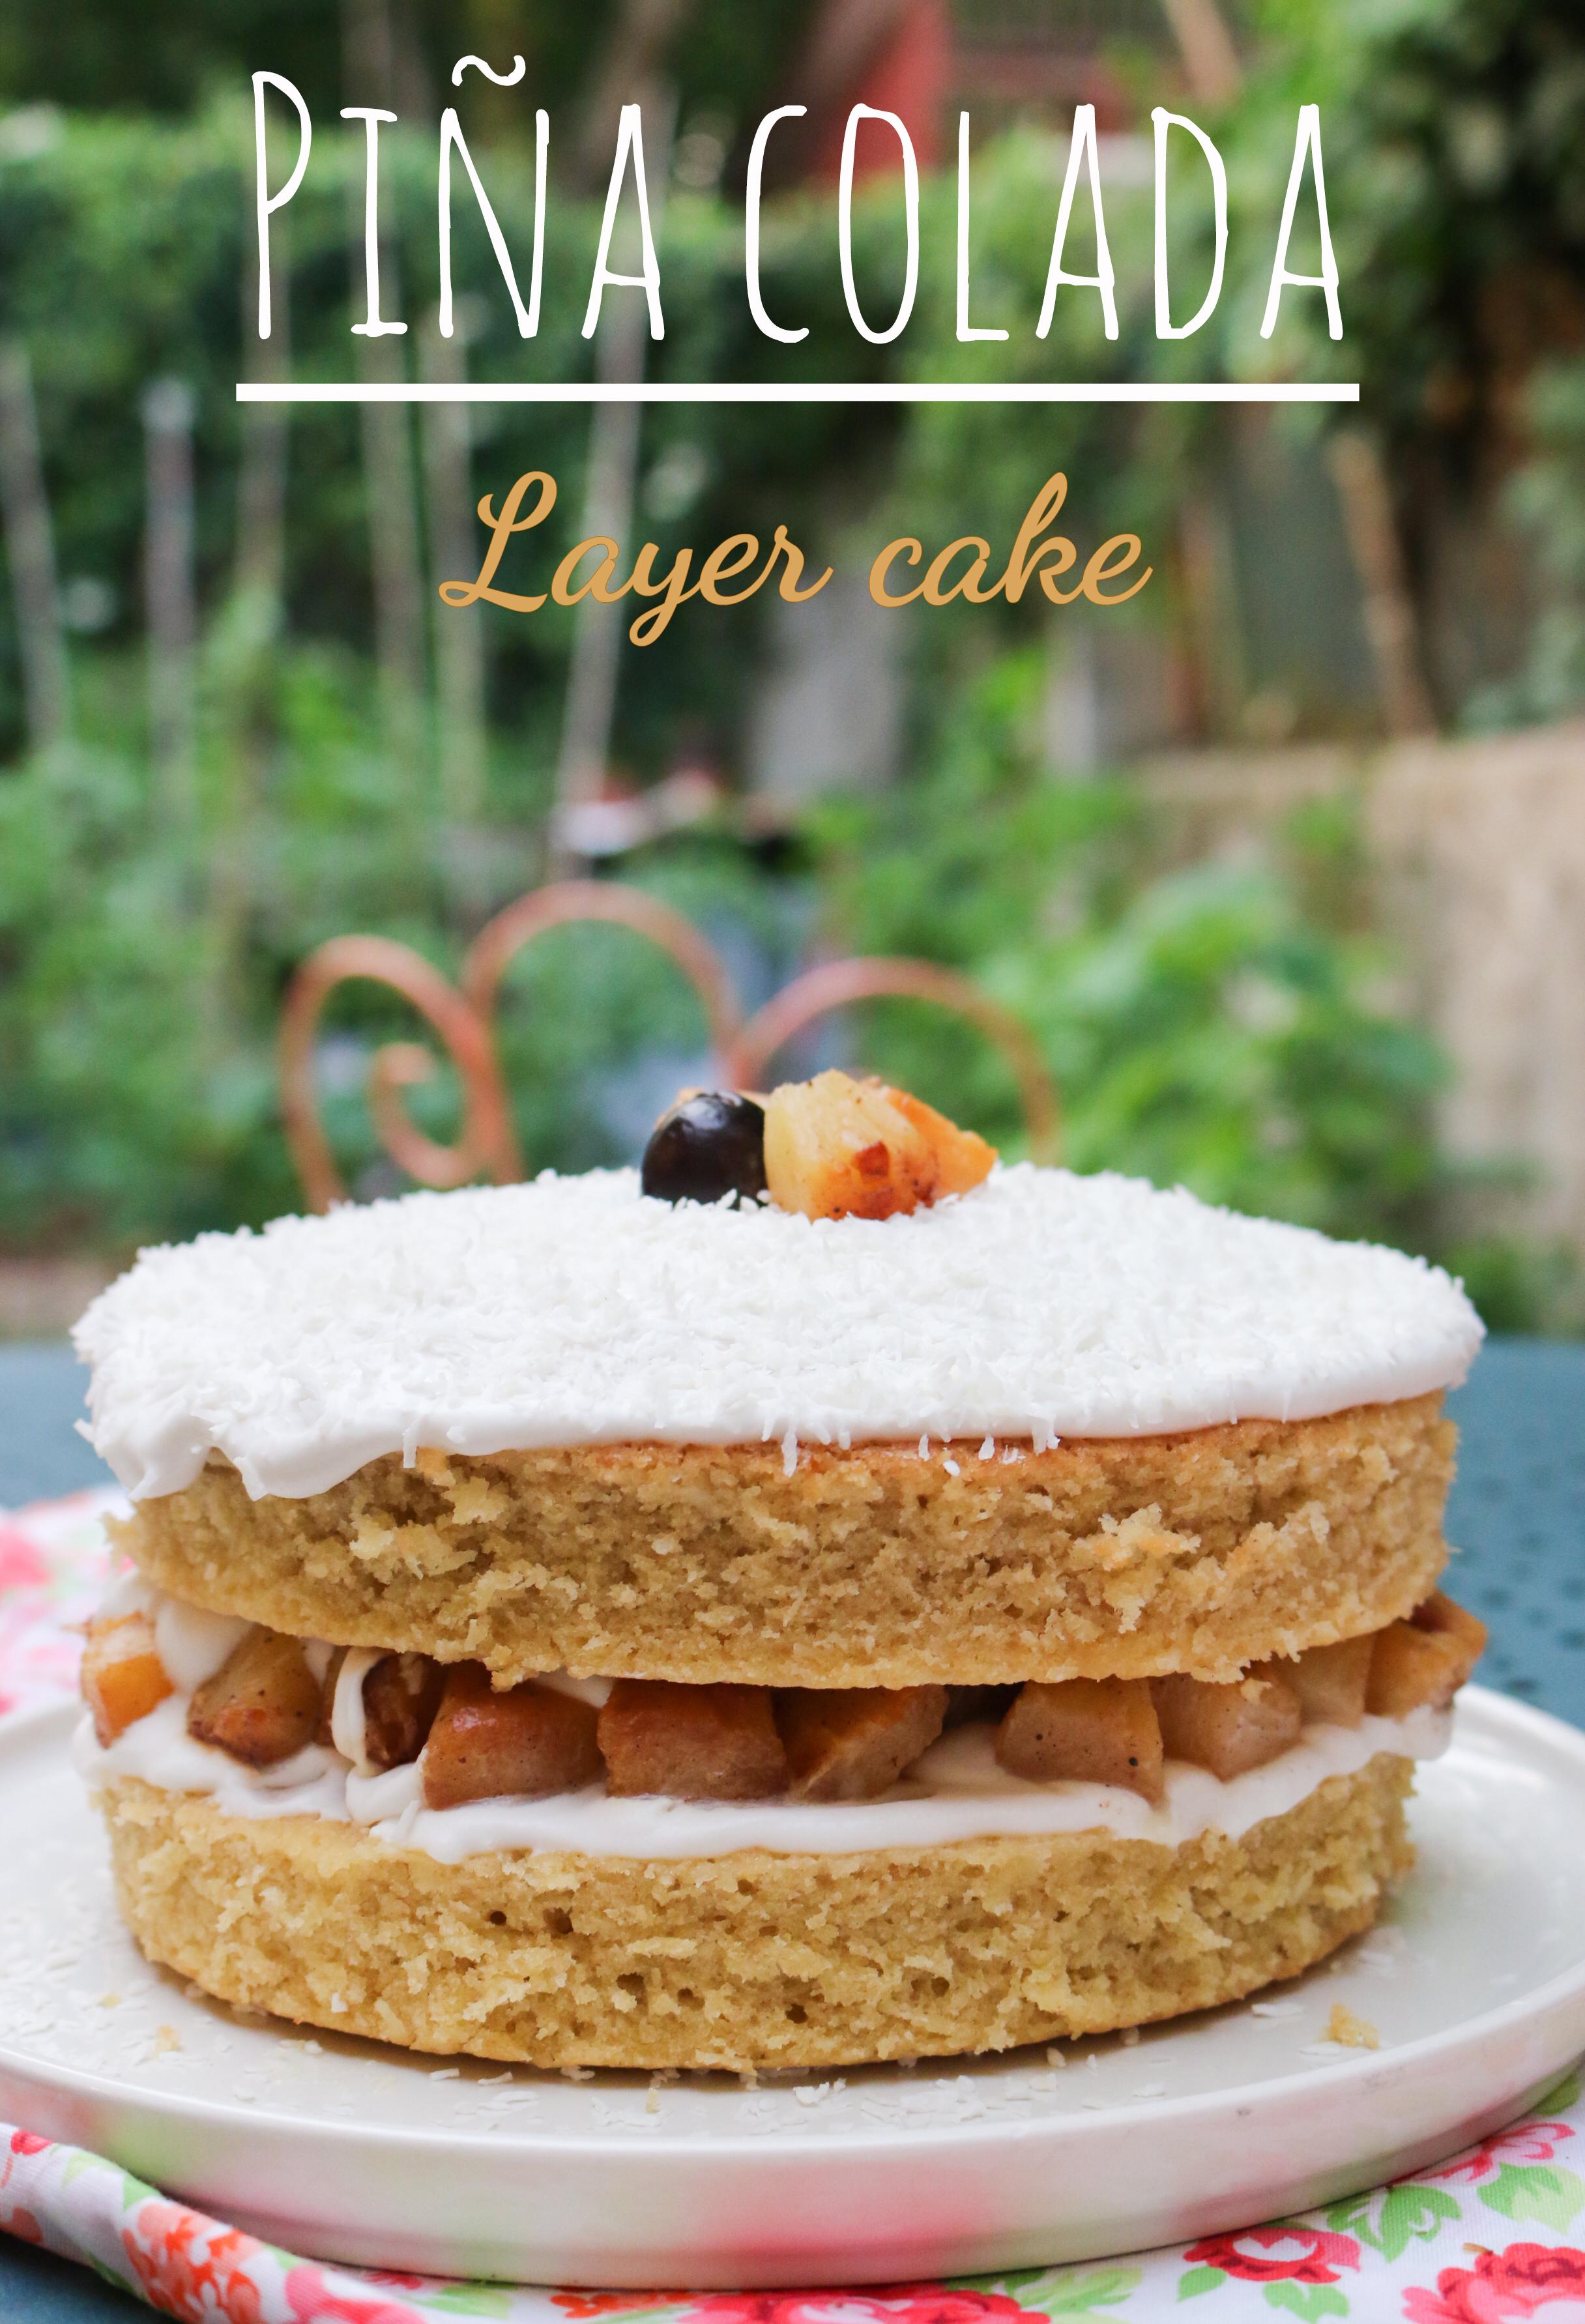 recette layer cake pina colada vegan : coco et ananas